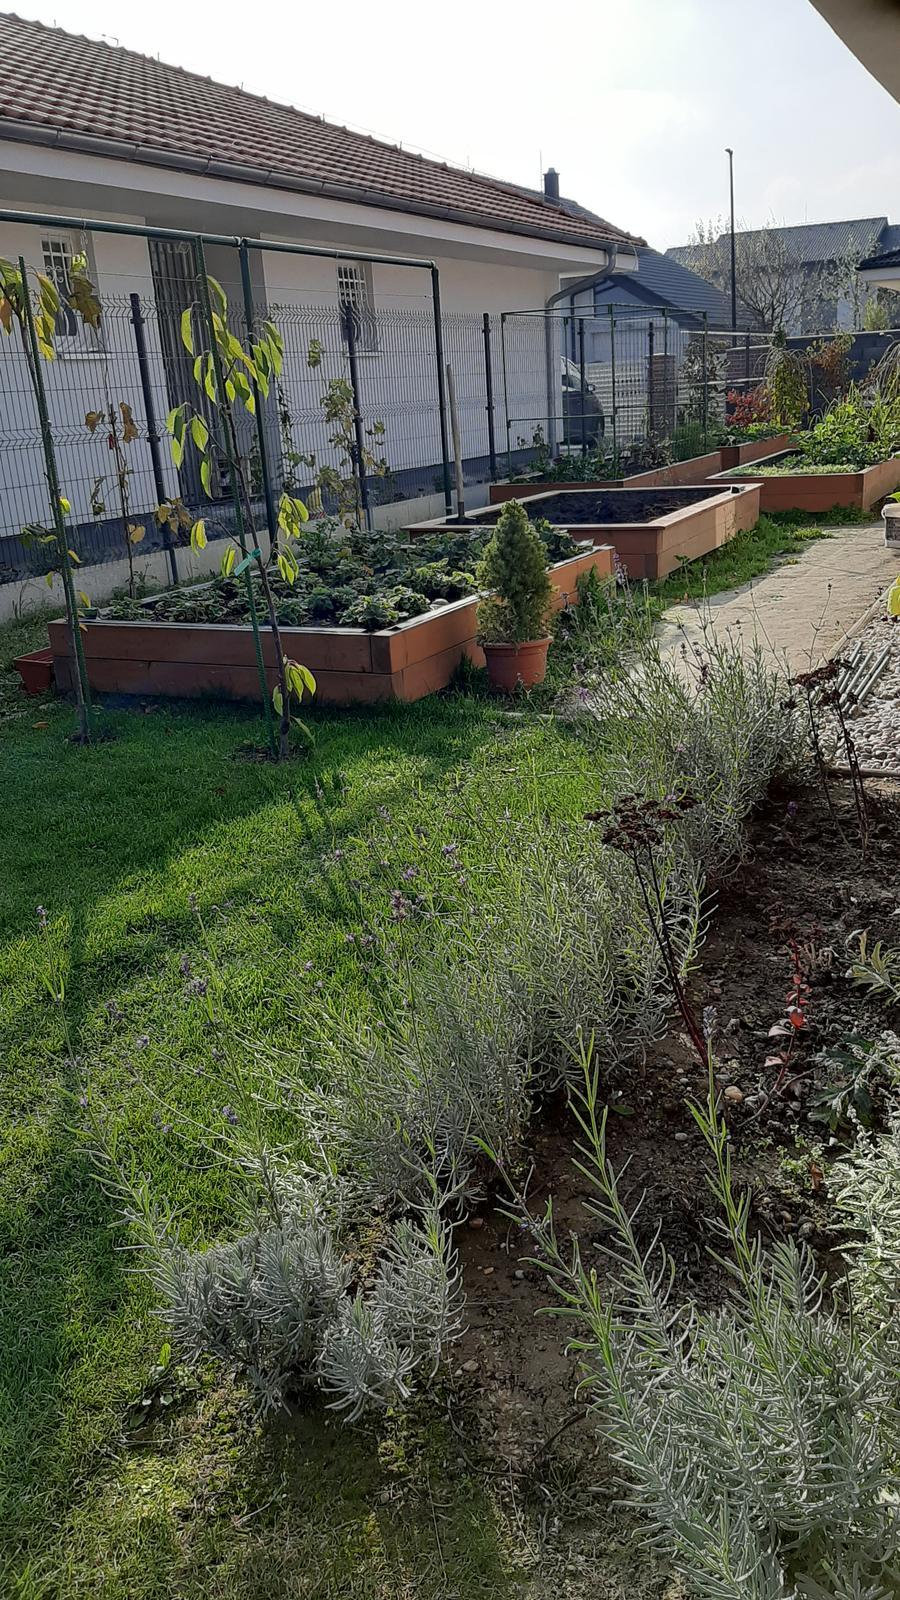 🏠🌞🌺❤🌷 Zahrada a jej dalsi rok...2020 🌱🐞🐛🦋🍓🥕🍅🌺❤ - Zahony uz skoro prazdne....